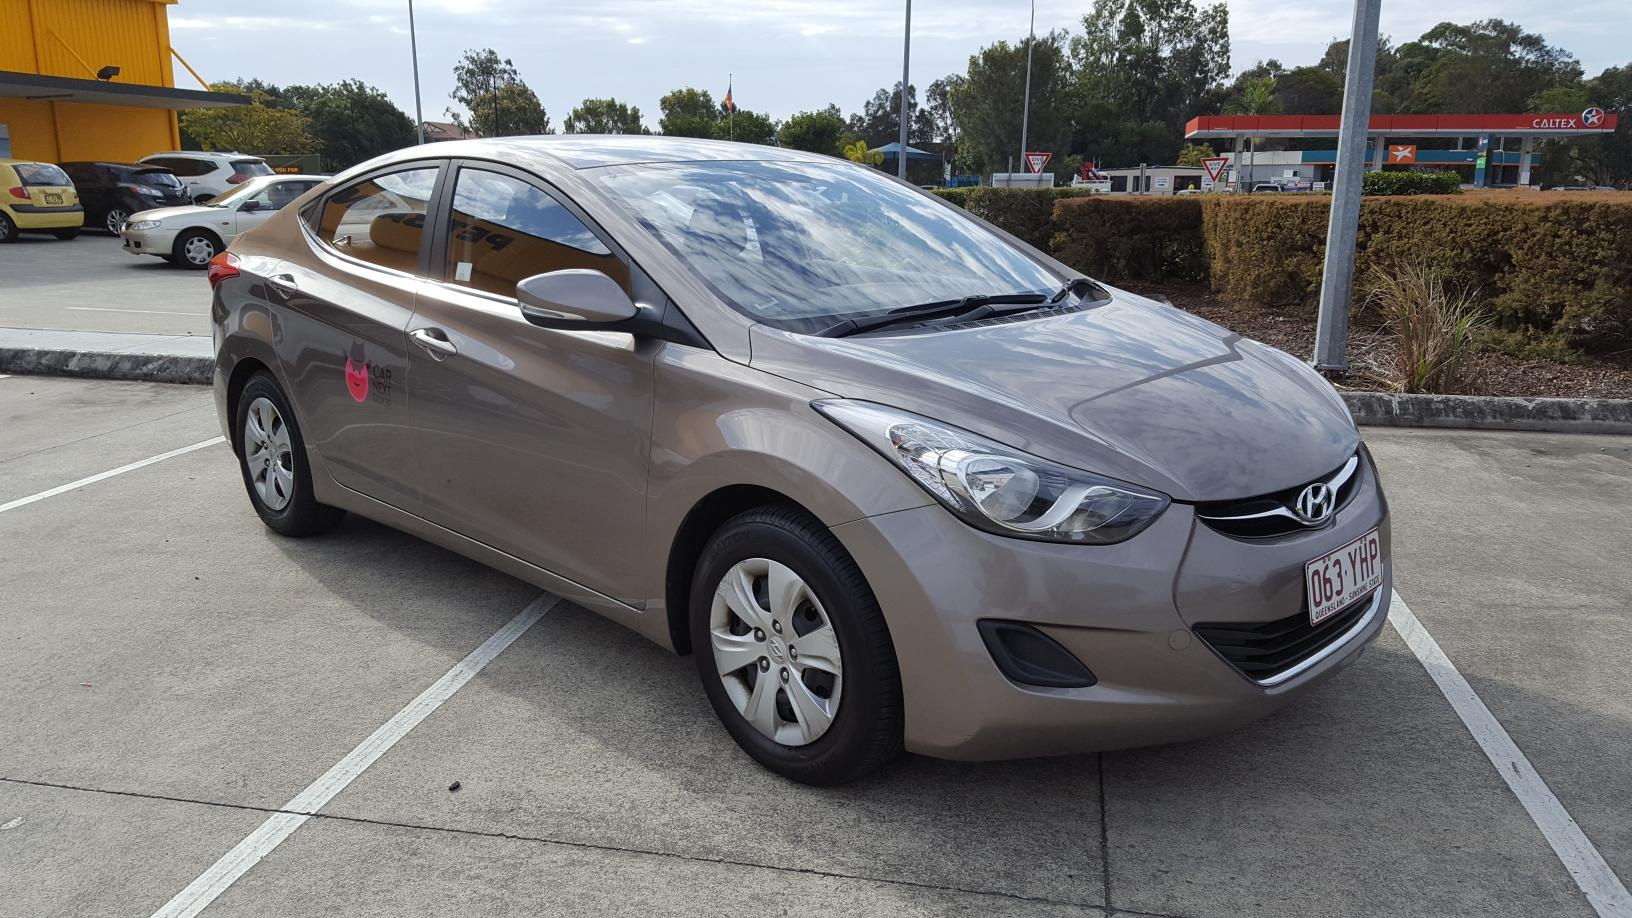 Picture of Jennifer's 2013 Hyundai Elantra